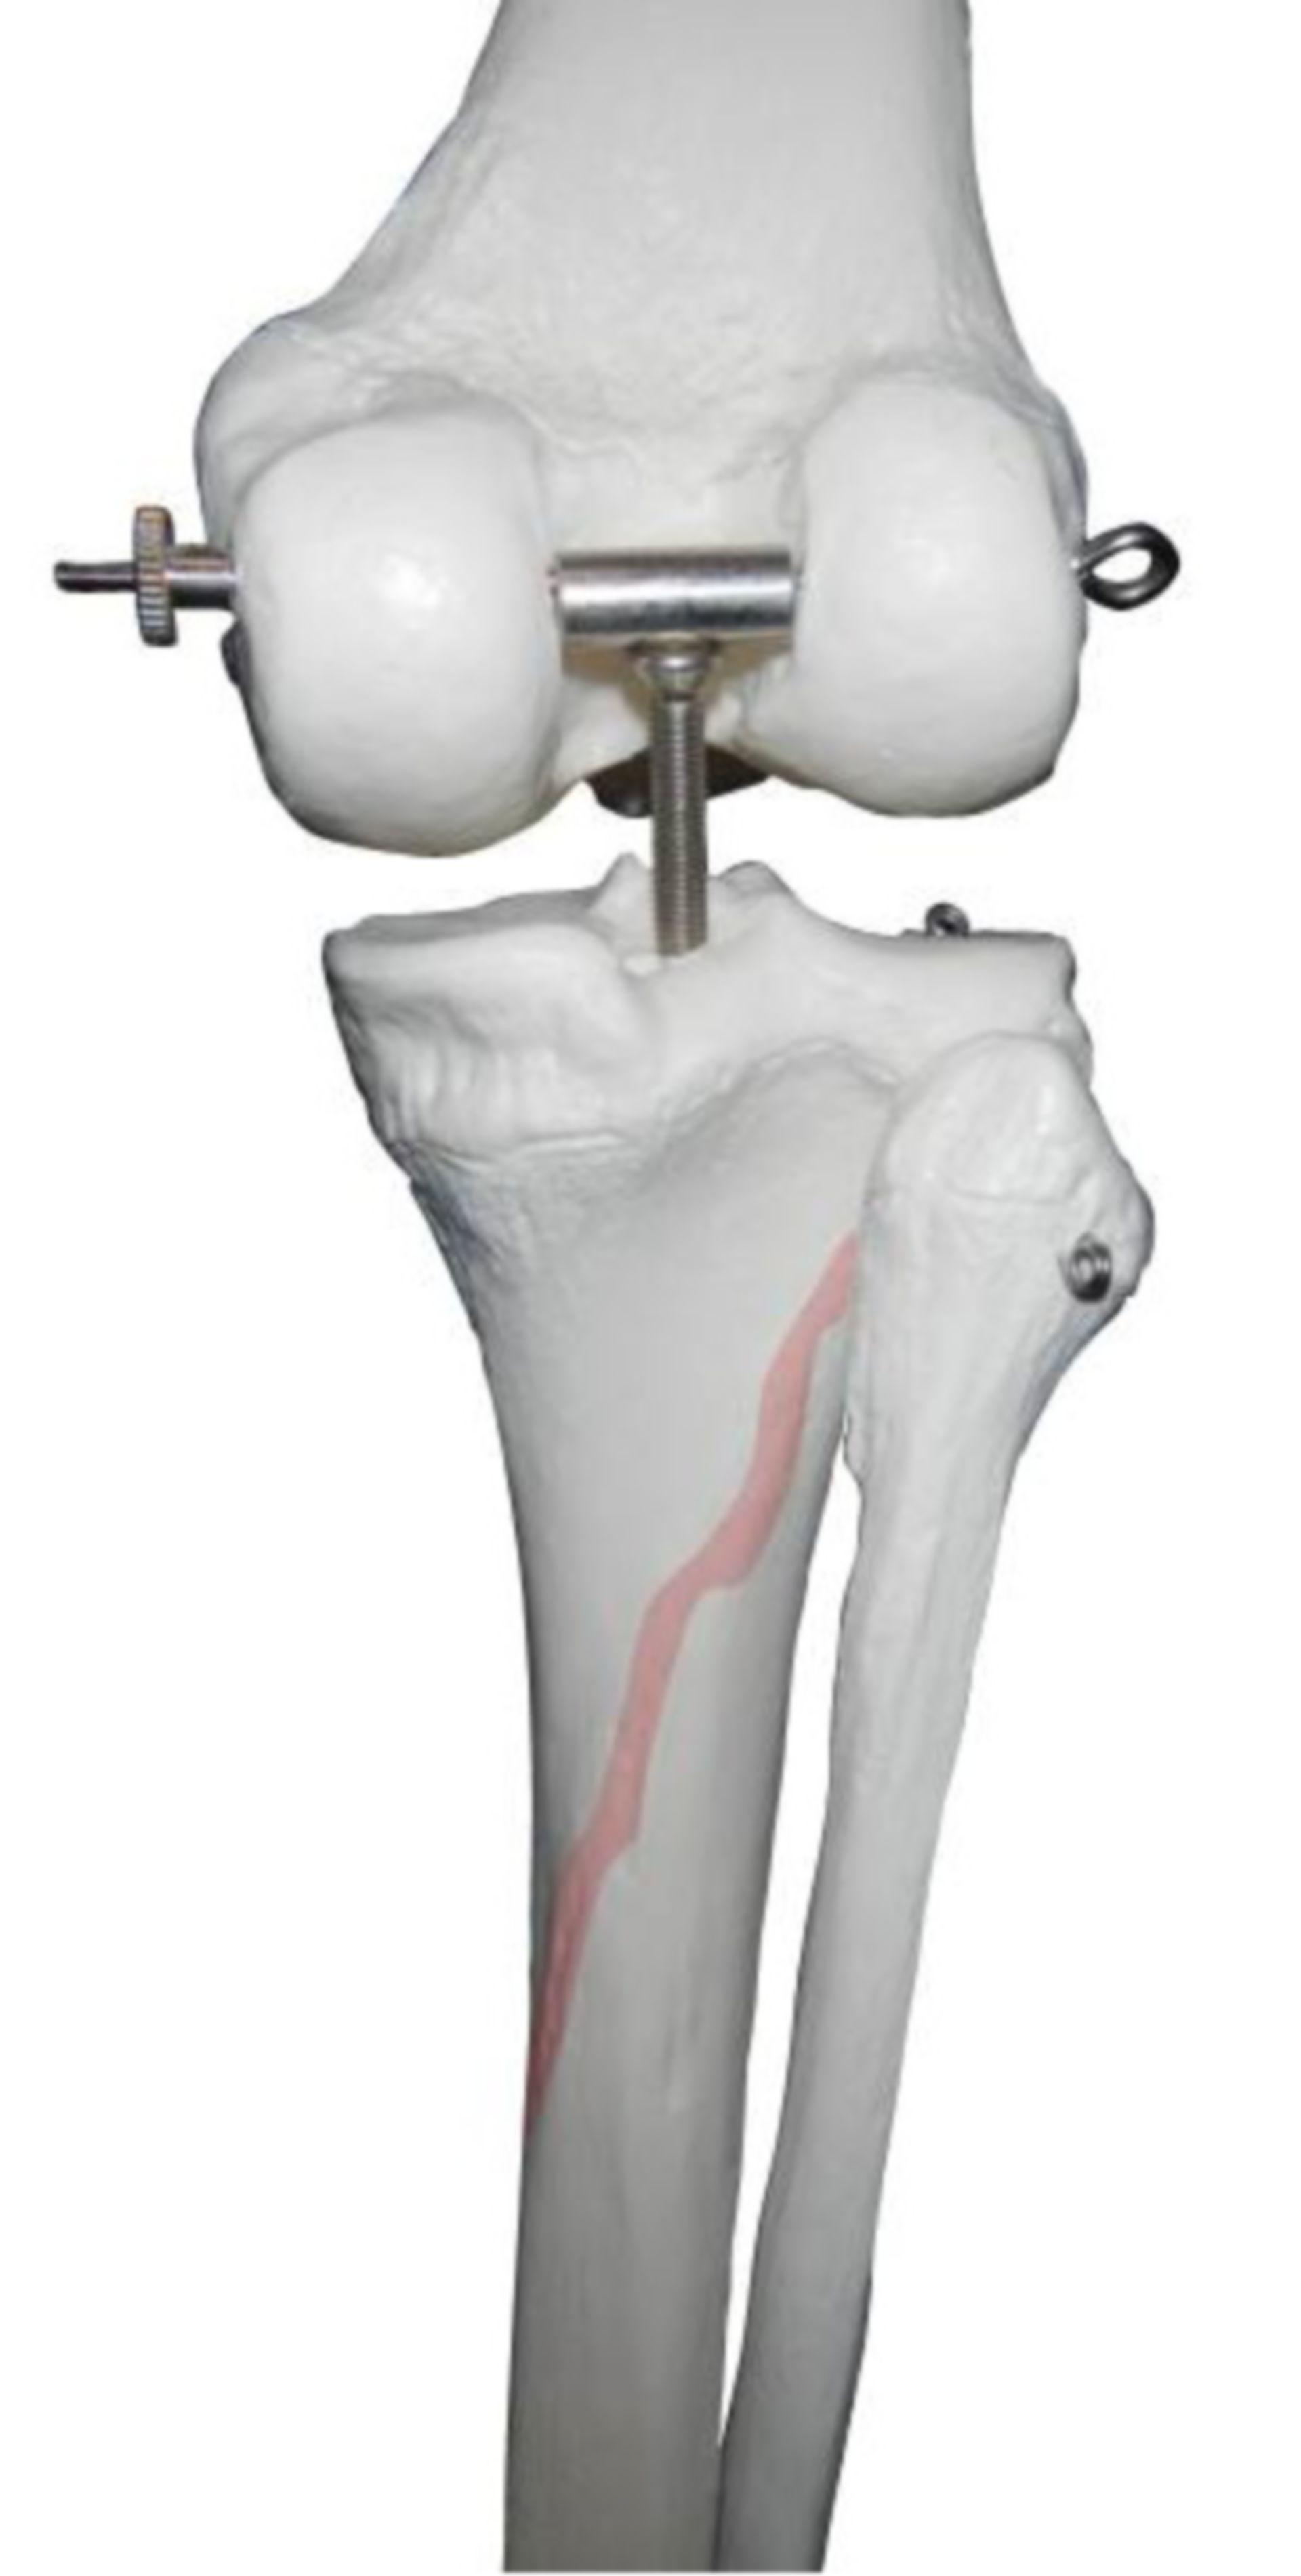 Linea musculi solei (linea del músculo sóleo)